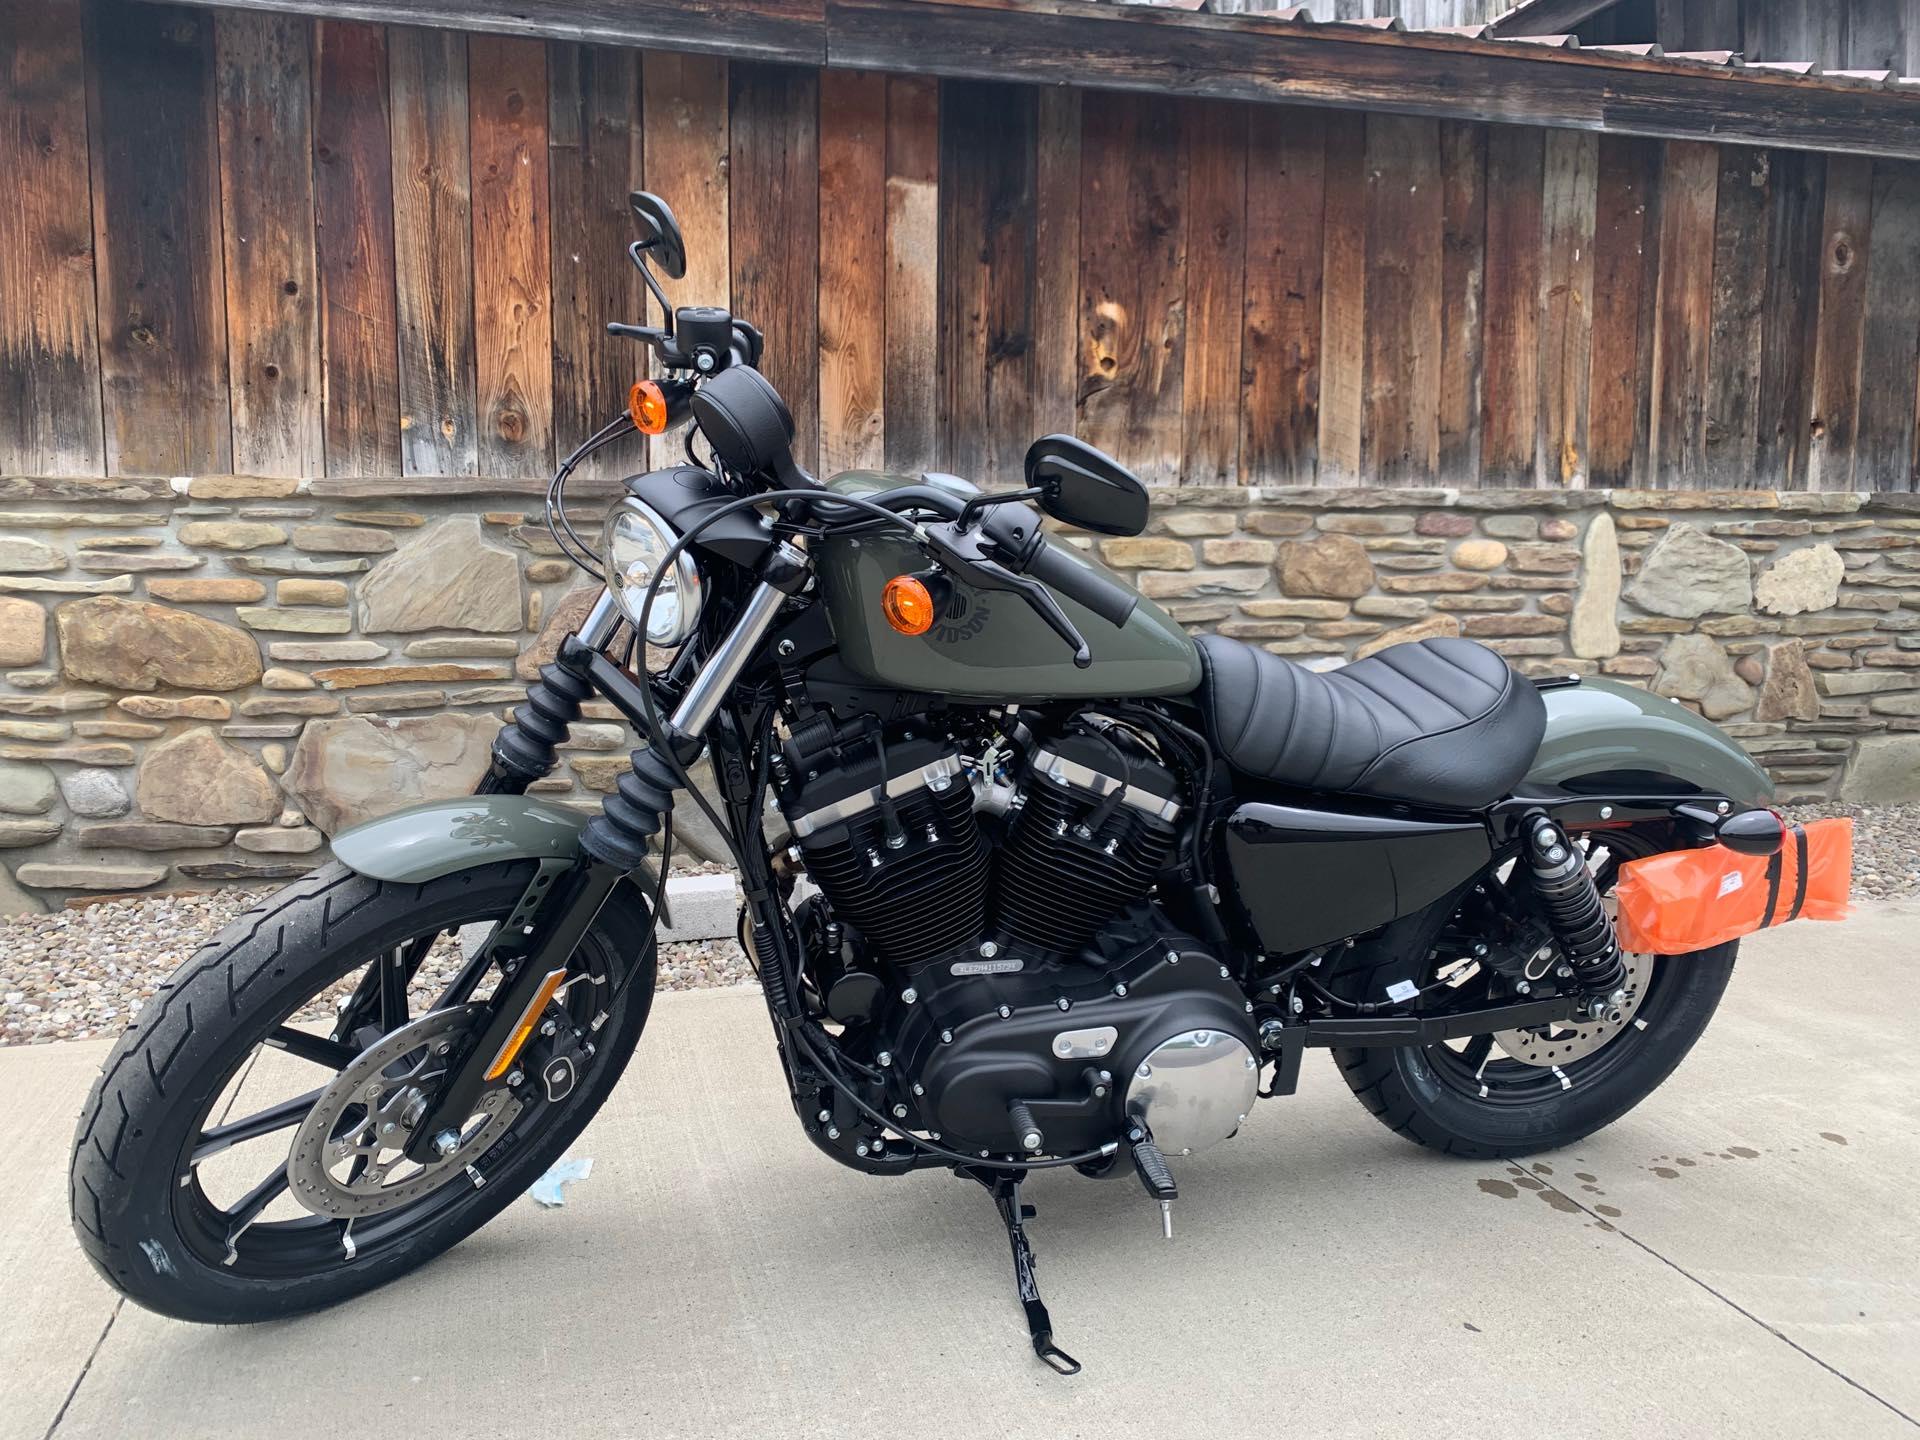 2021 Harley-Davidson Street XL 883N Iron 883 at Arkport Cycles